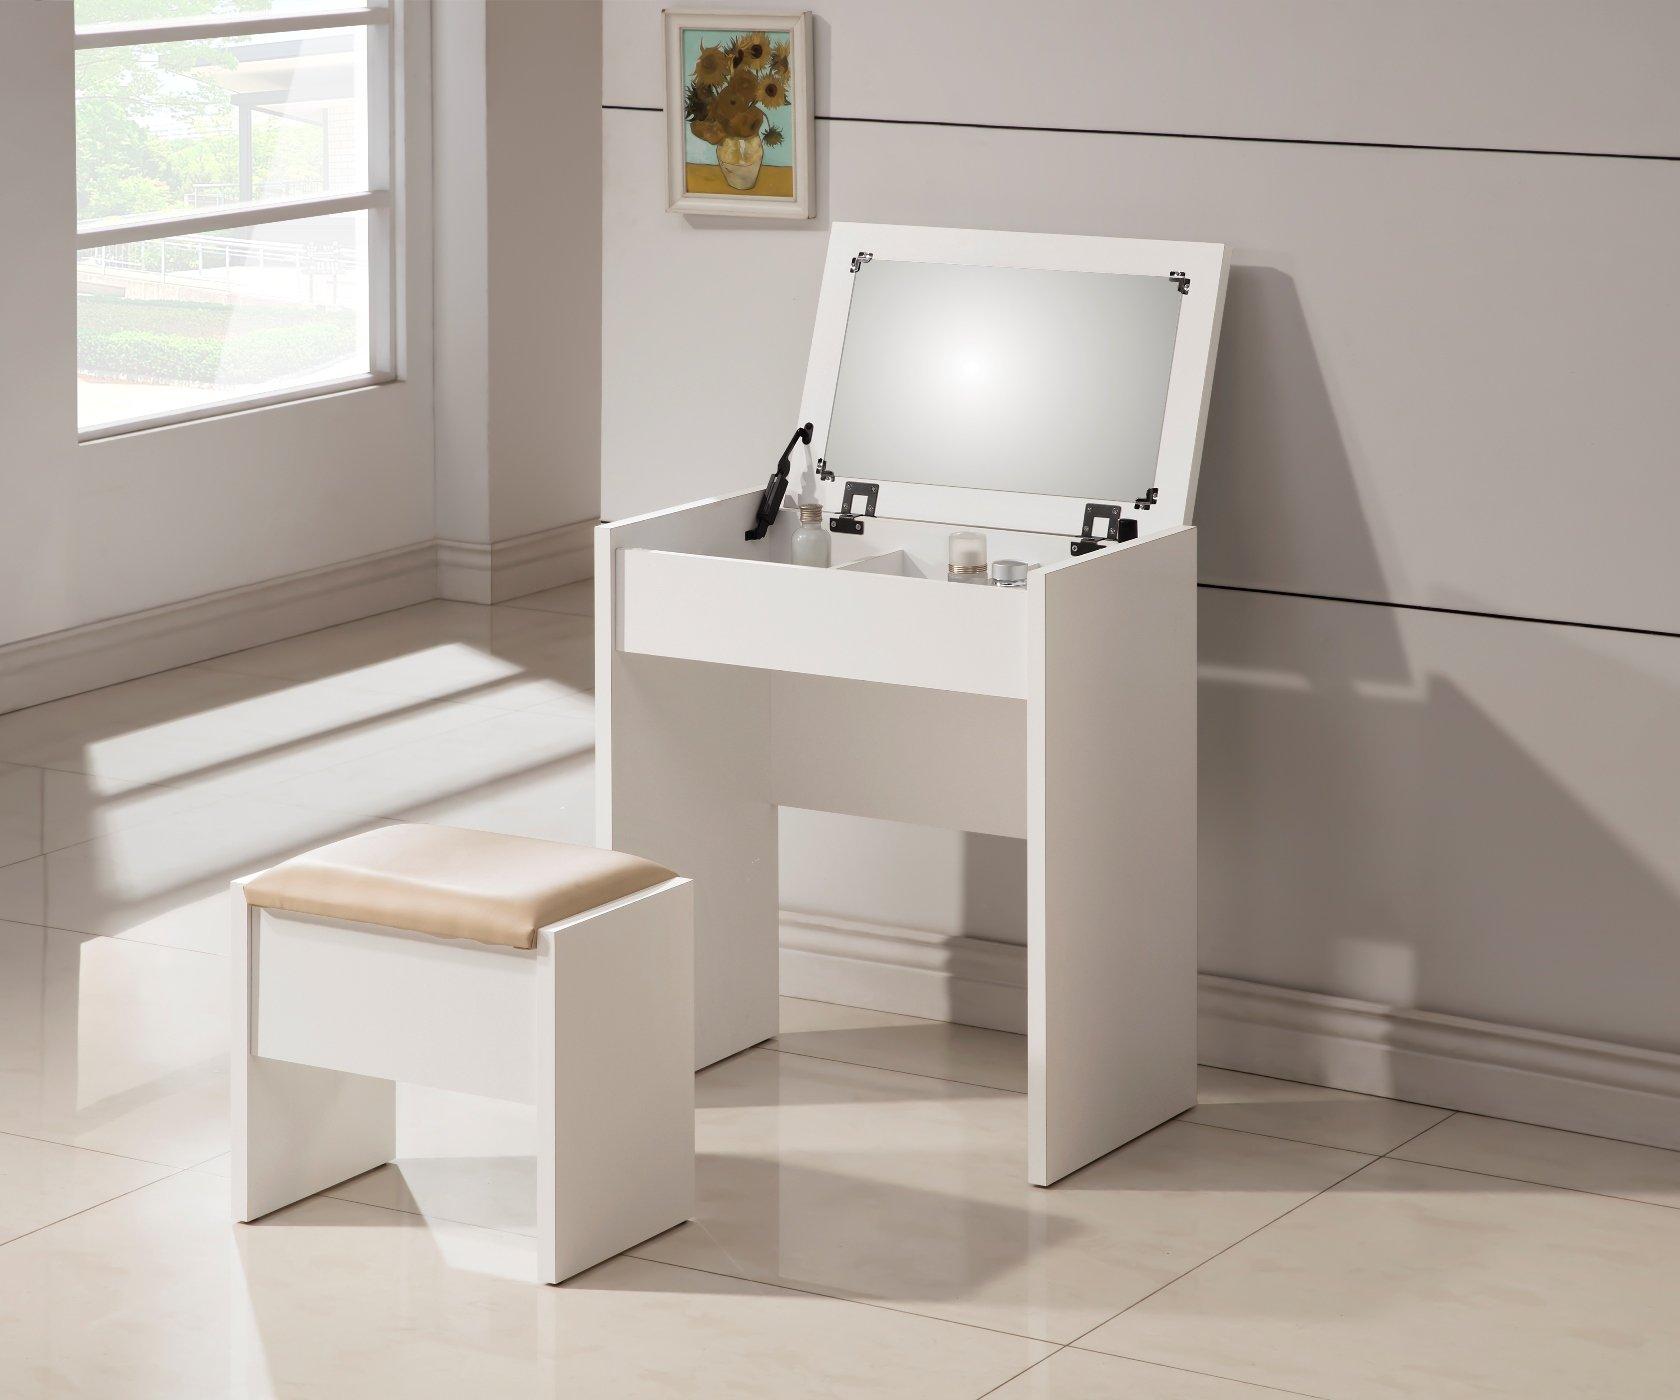 3-Piece Metal Make-Up Heart Mirror Vanity Dresser Table and Beige Stool Set, White